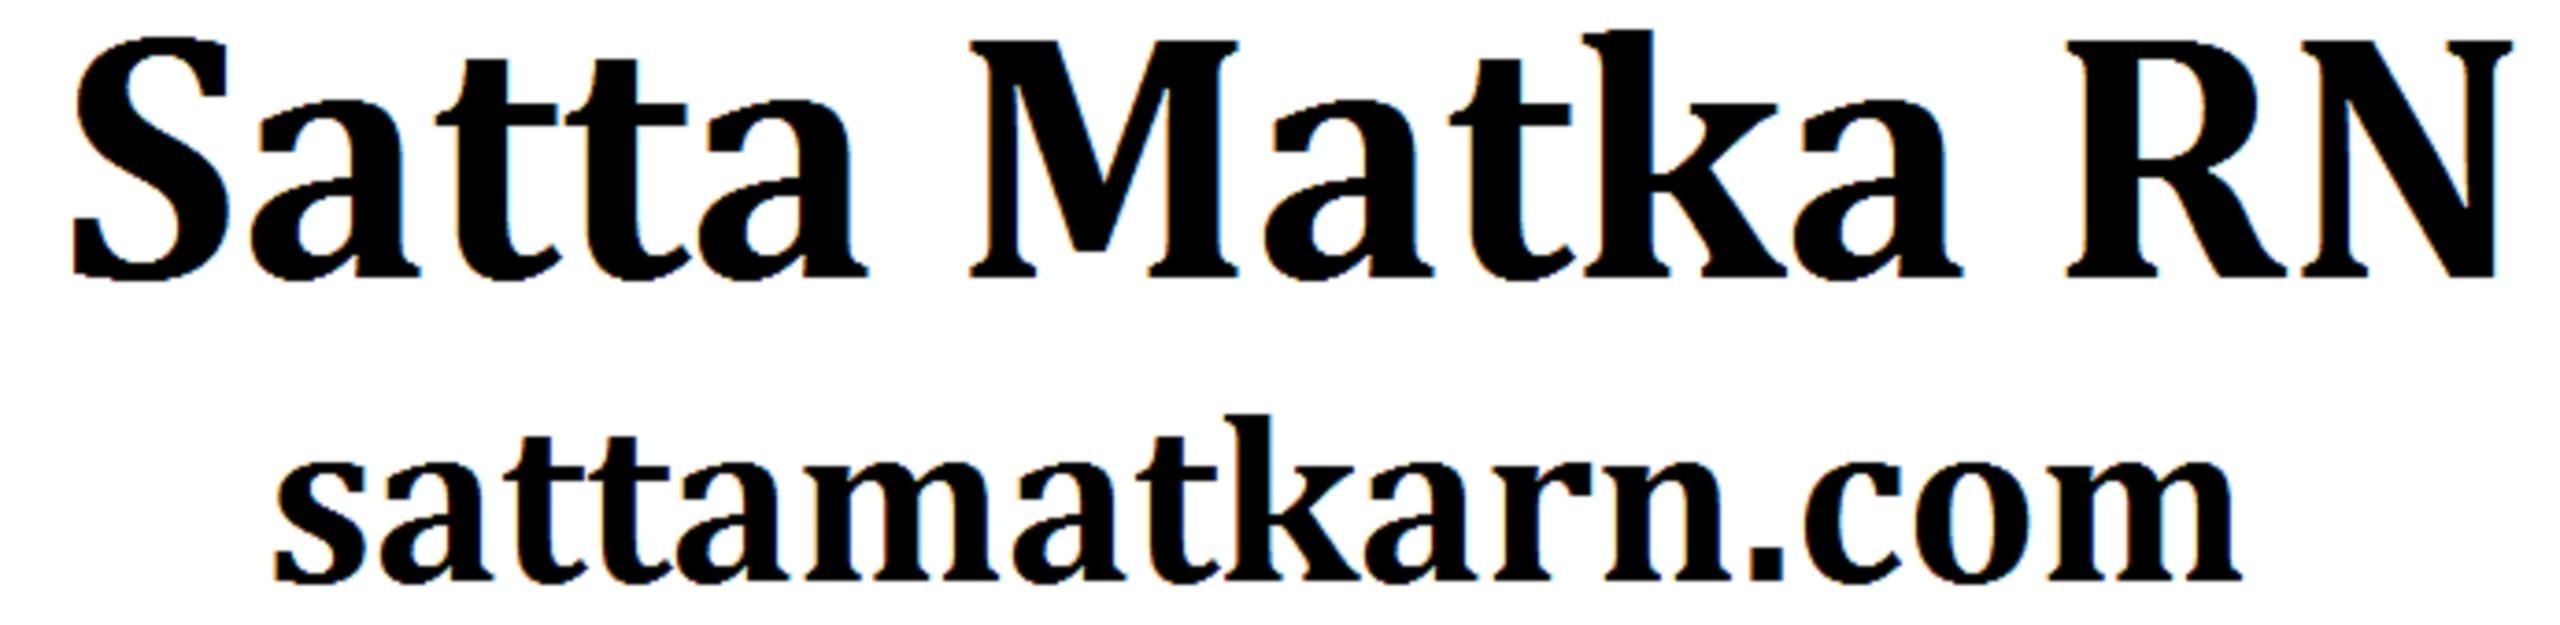 Satta Matka (@sattamatkarn) Cover Image